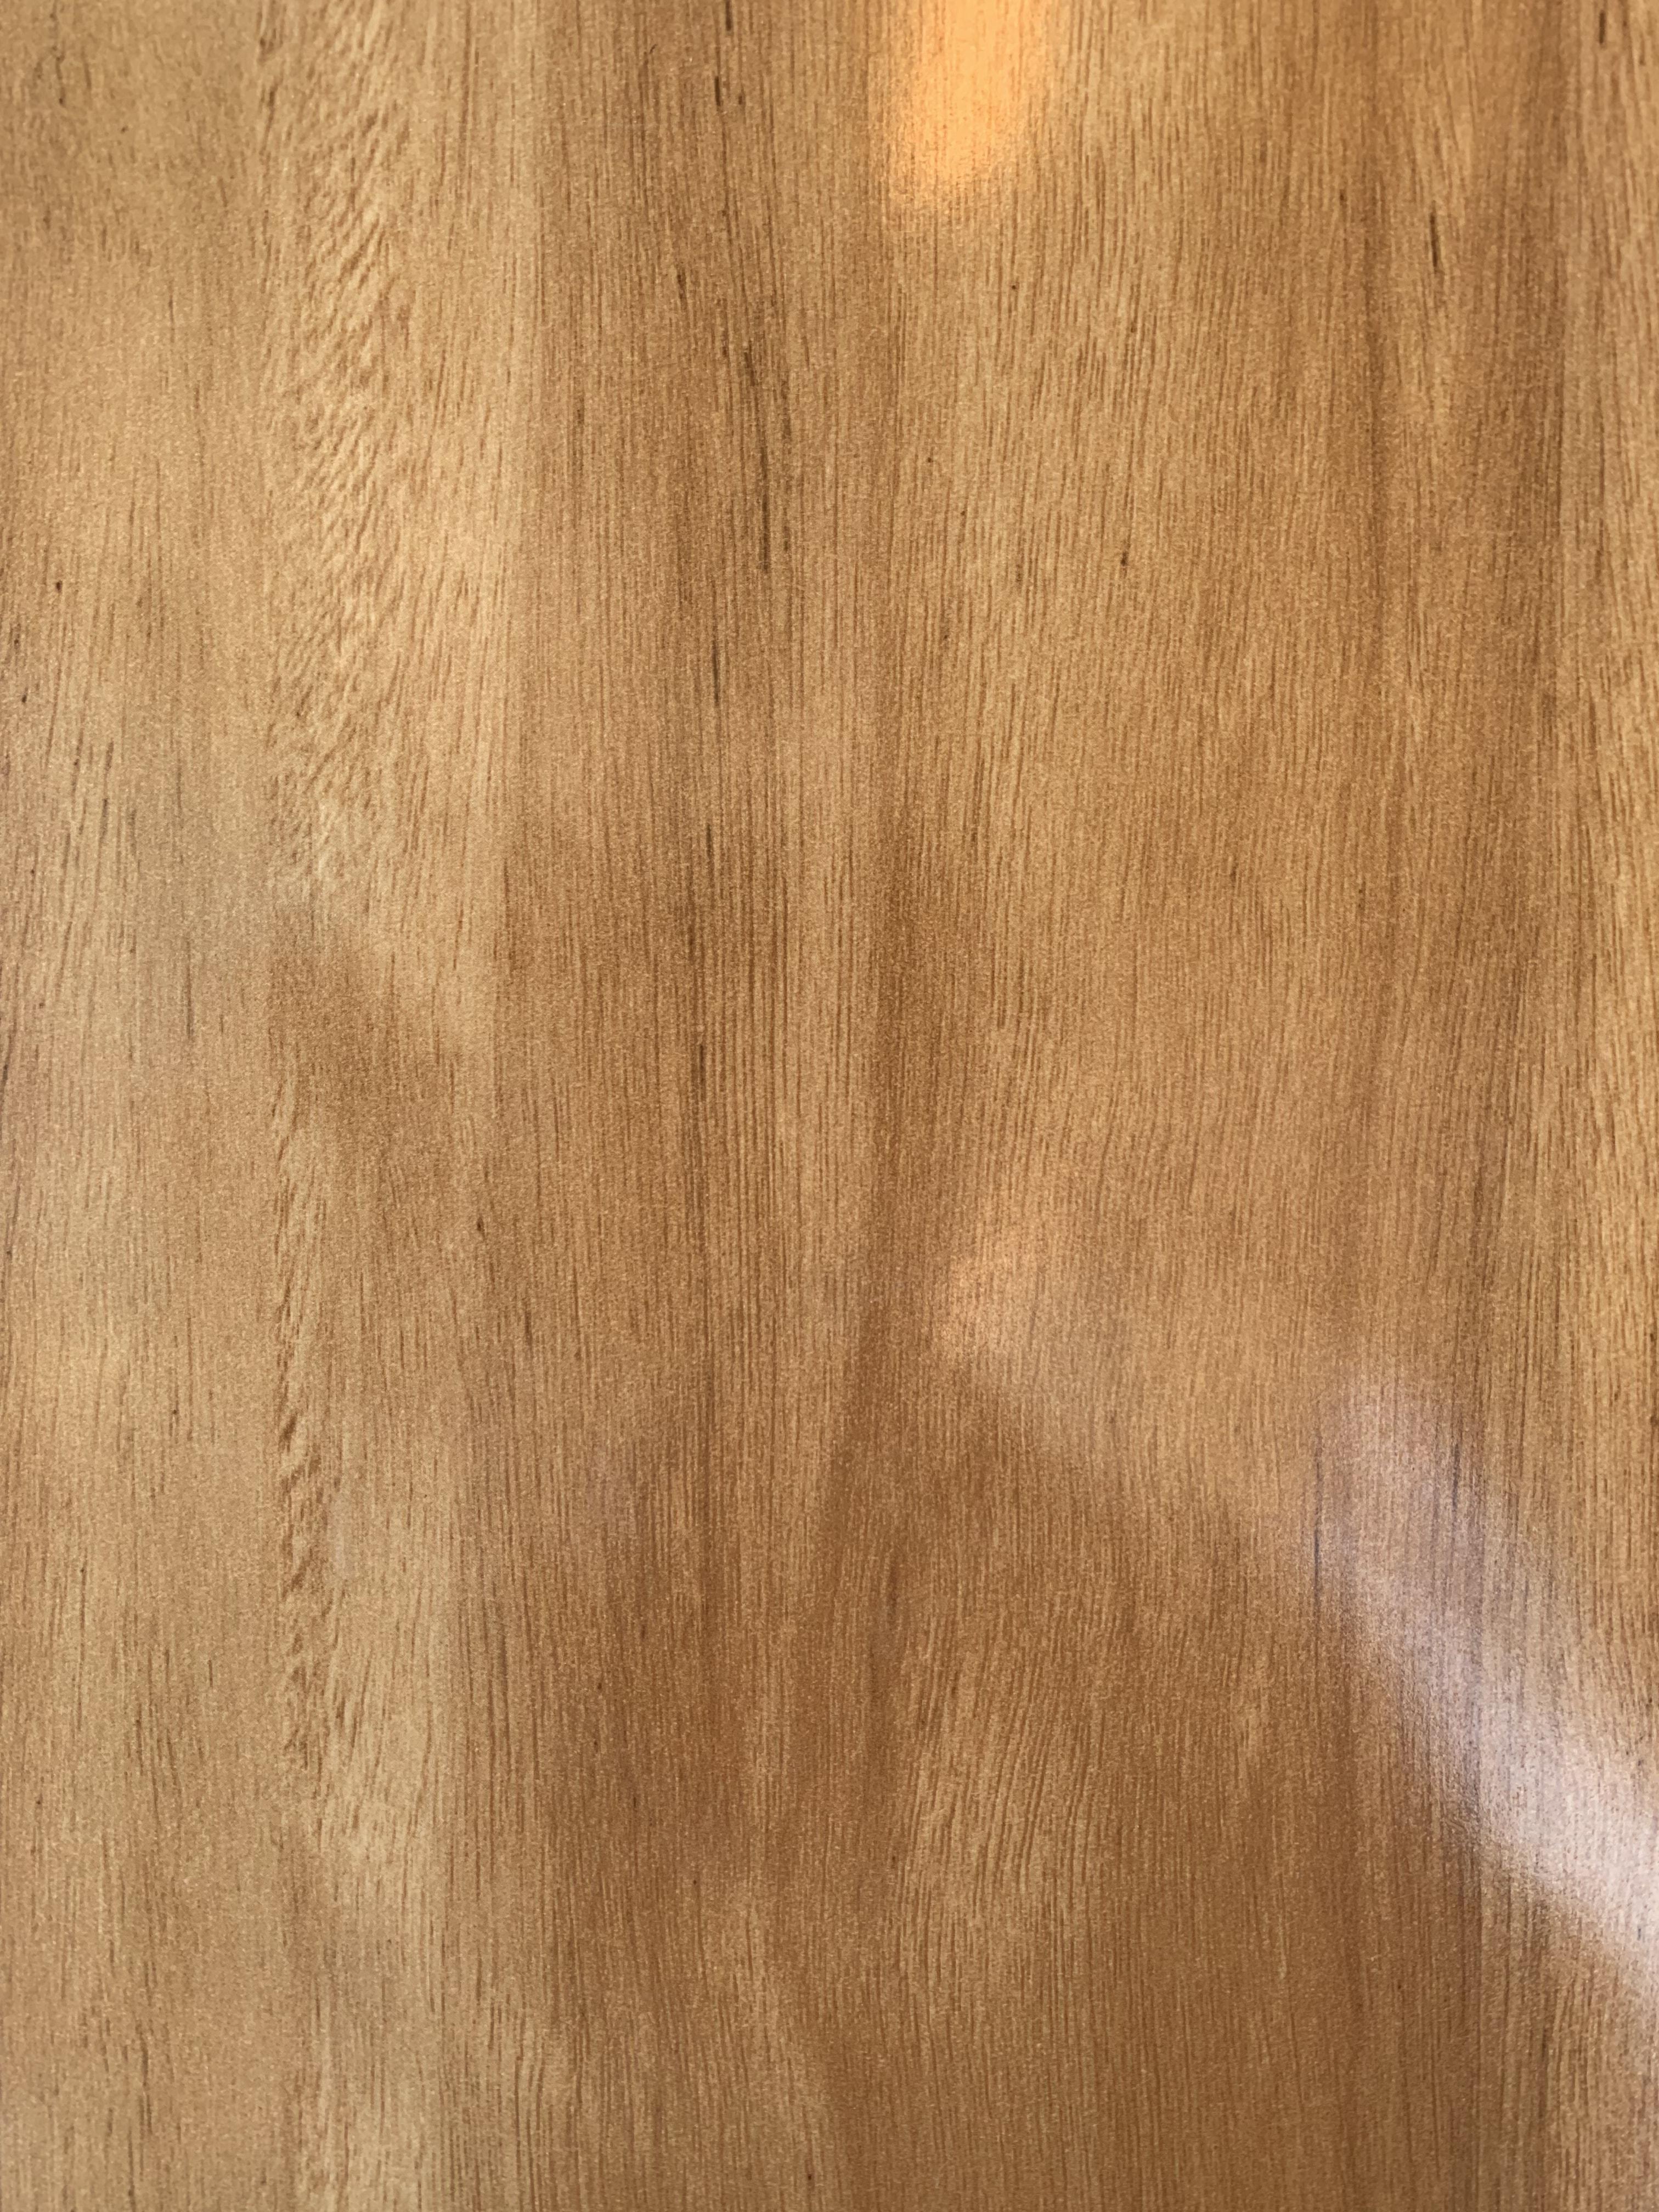 Tasmania Oak gloss Laminate flooring 1215x195x12mm